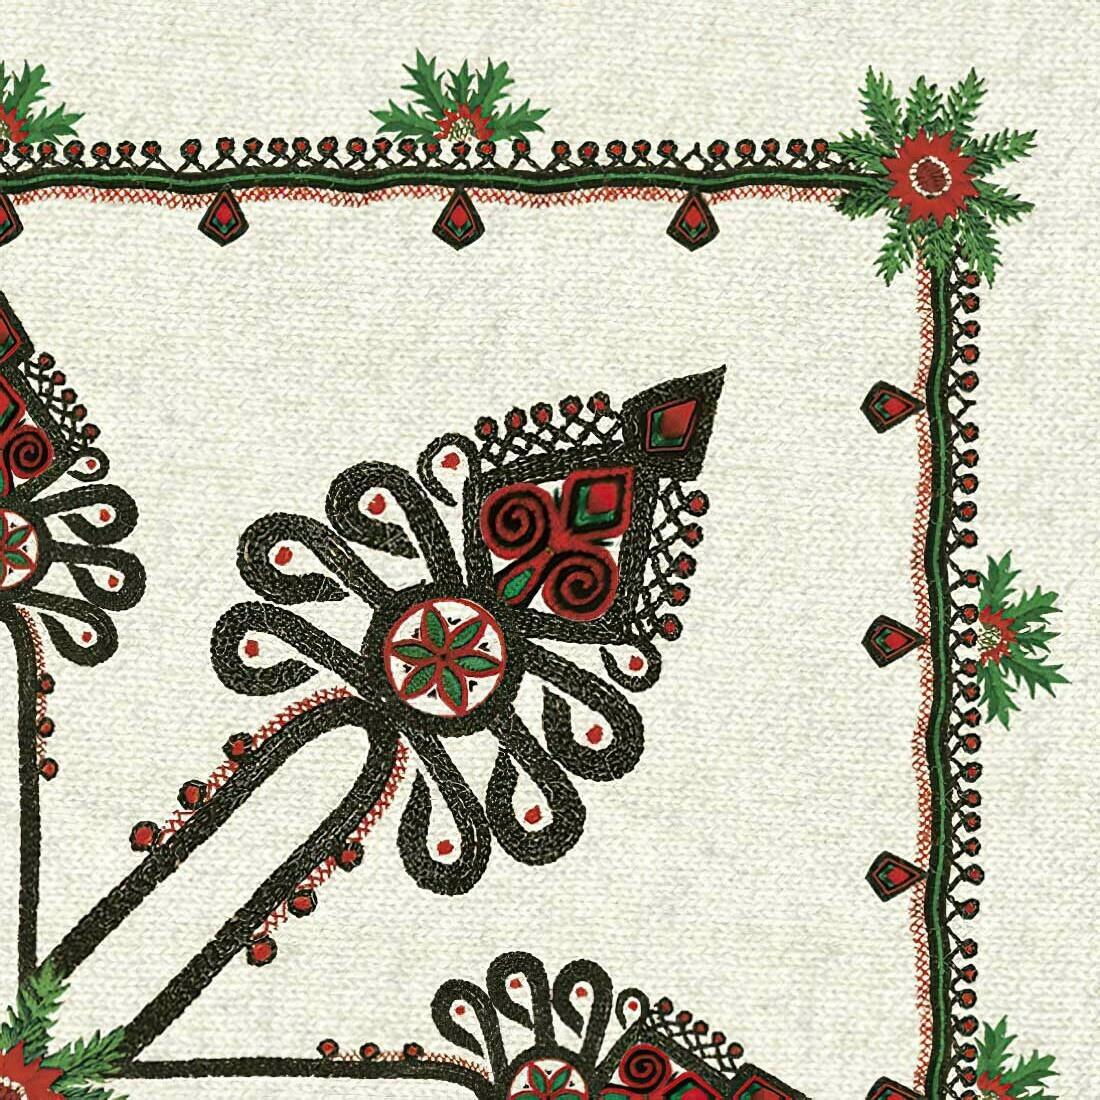 Decoupage Paper Napkins - Parzenica Pattern (1 Sheet)